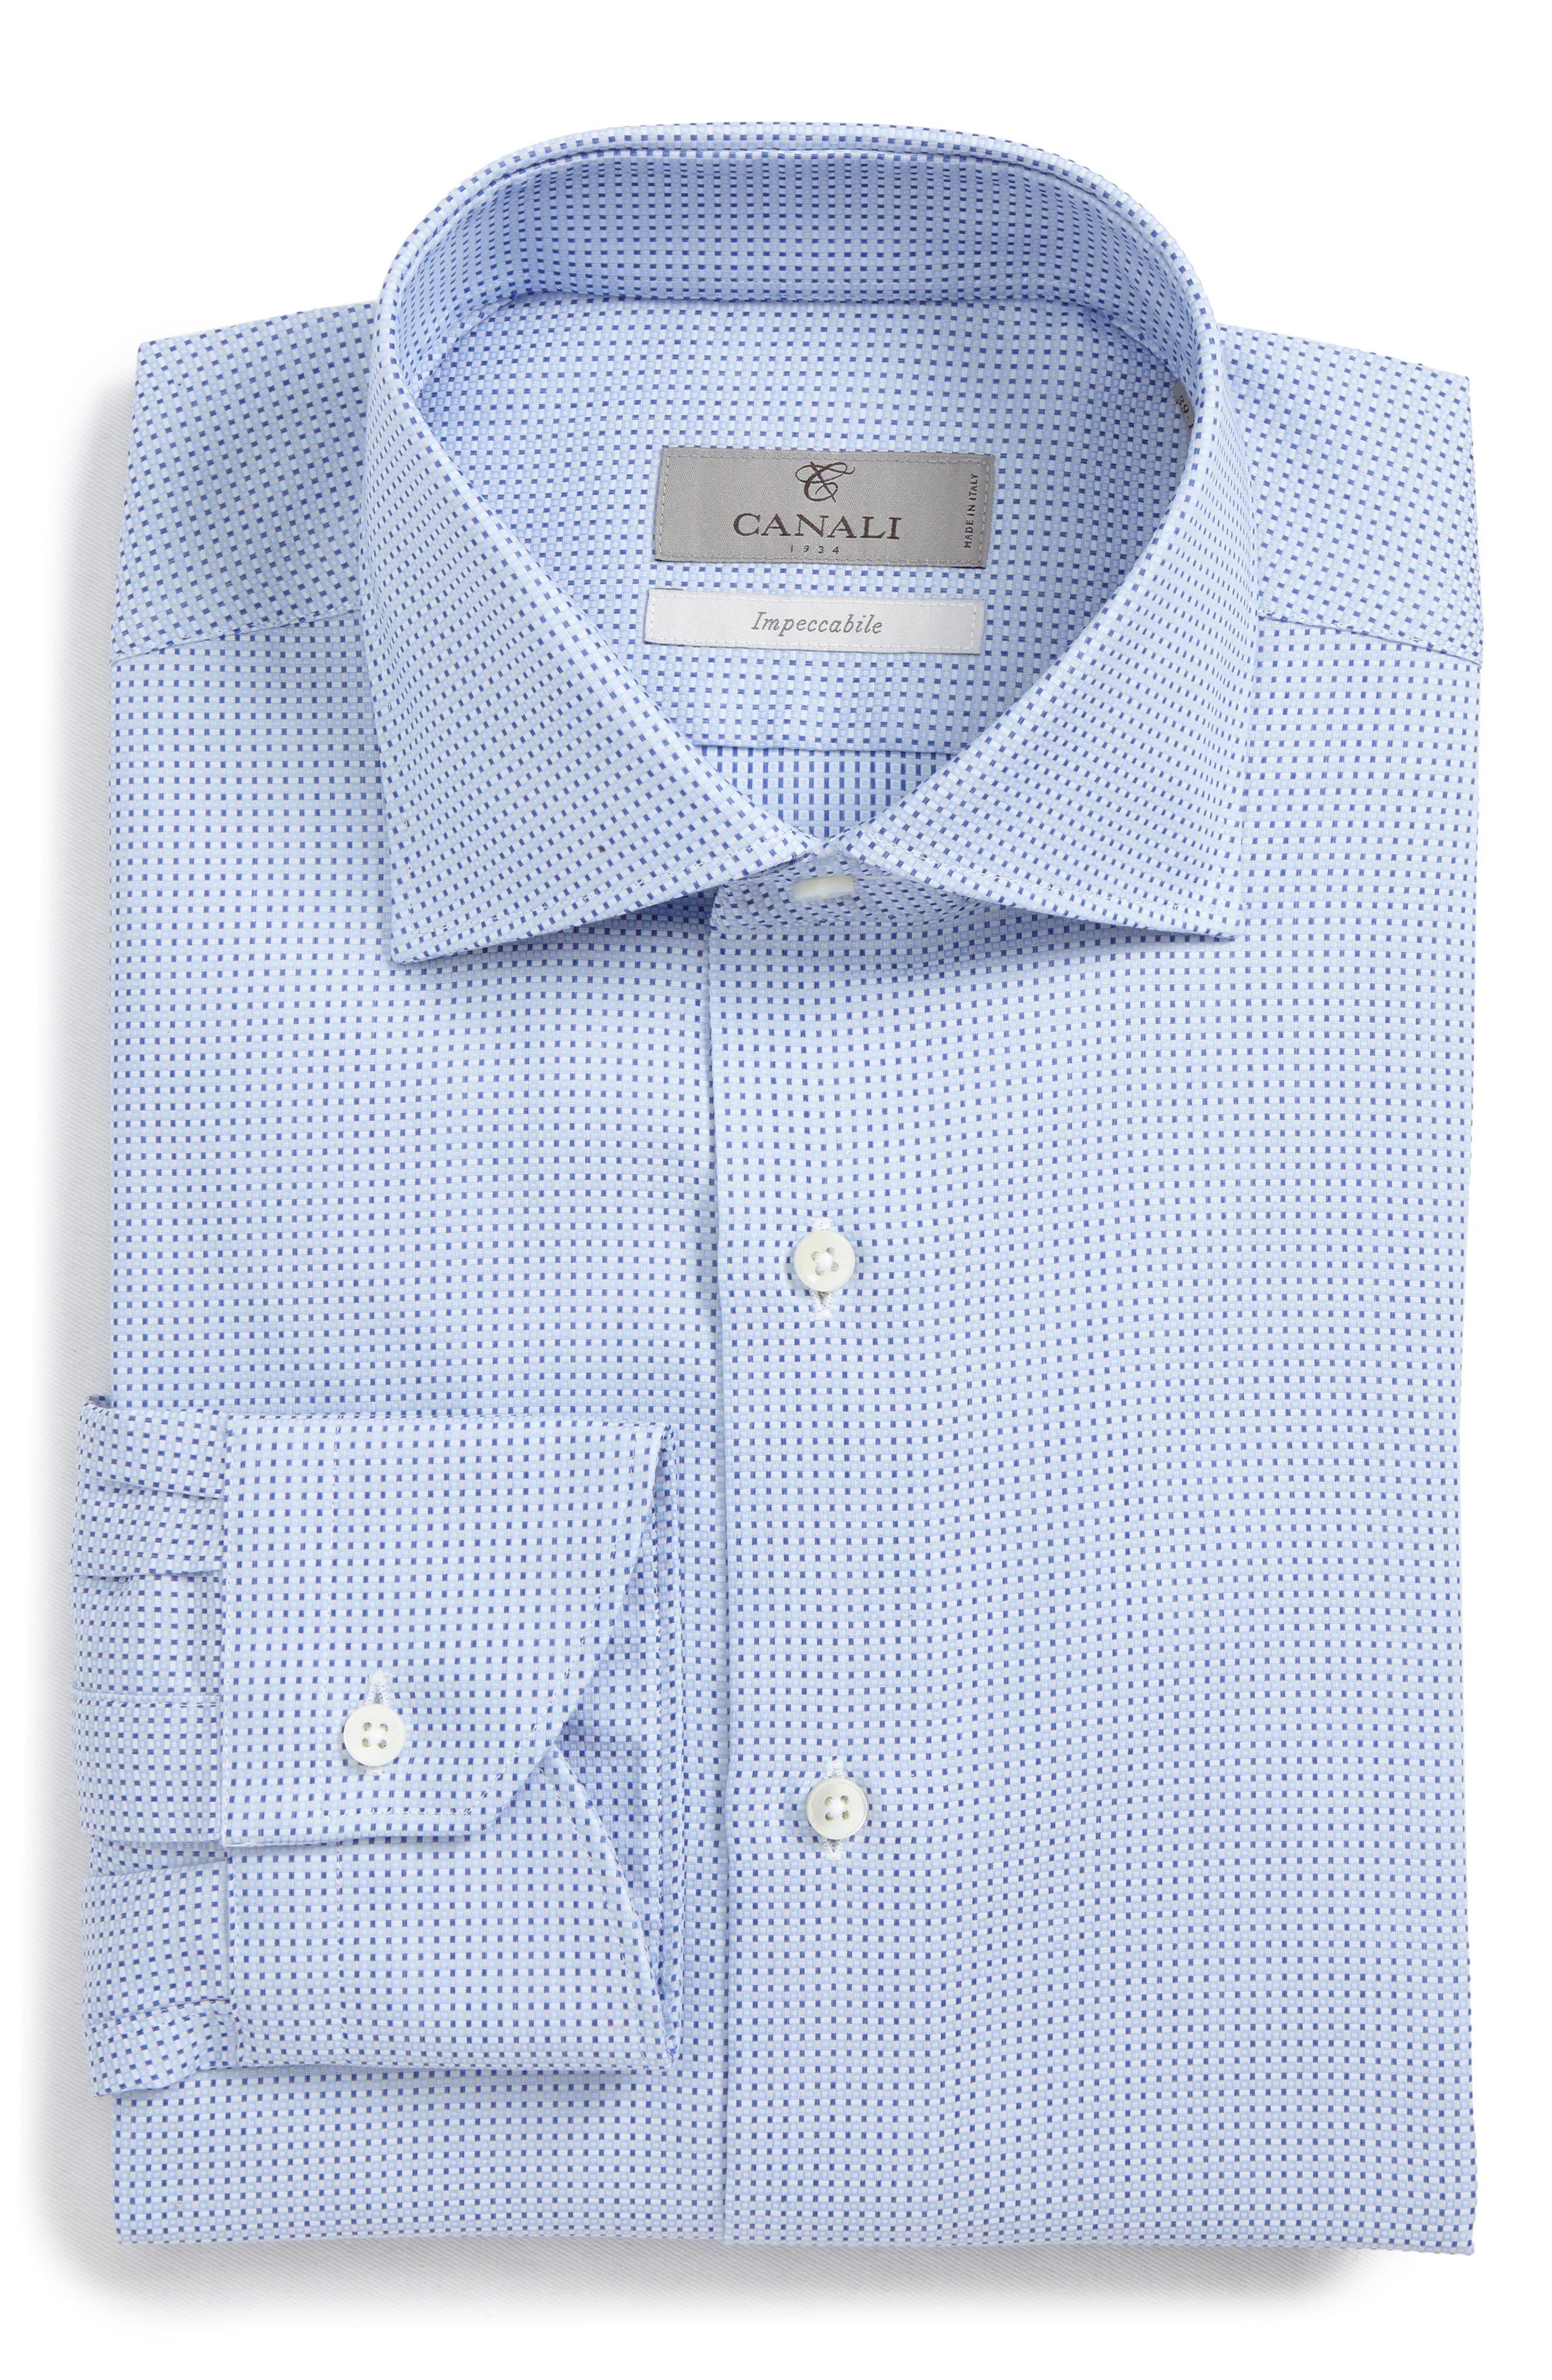 Regular Fit Geometric Dress Shirt,                         Main,                         color, 450